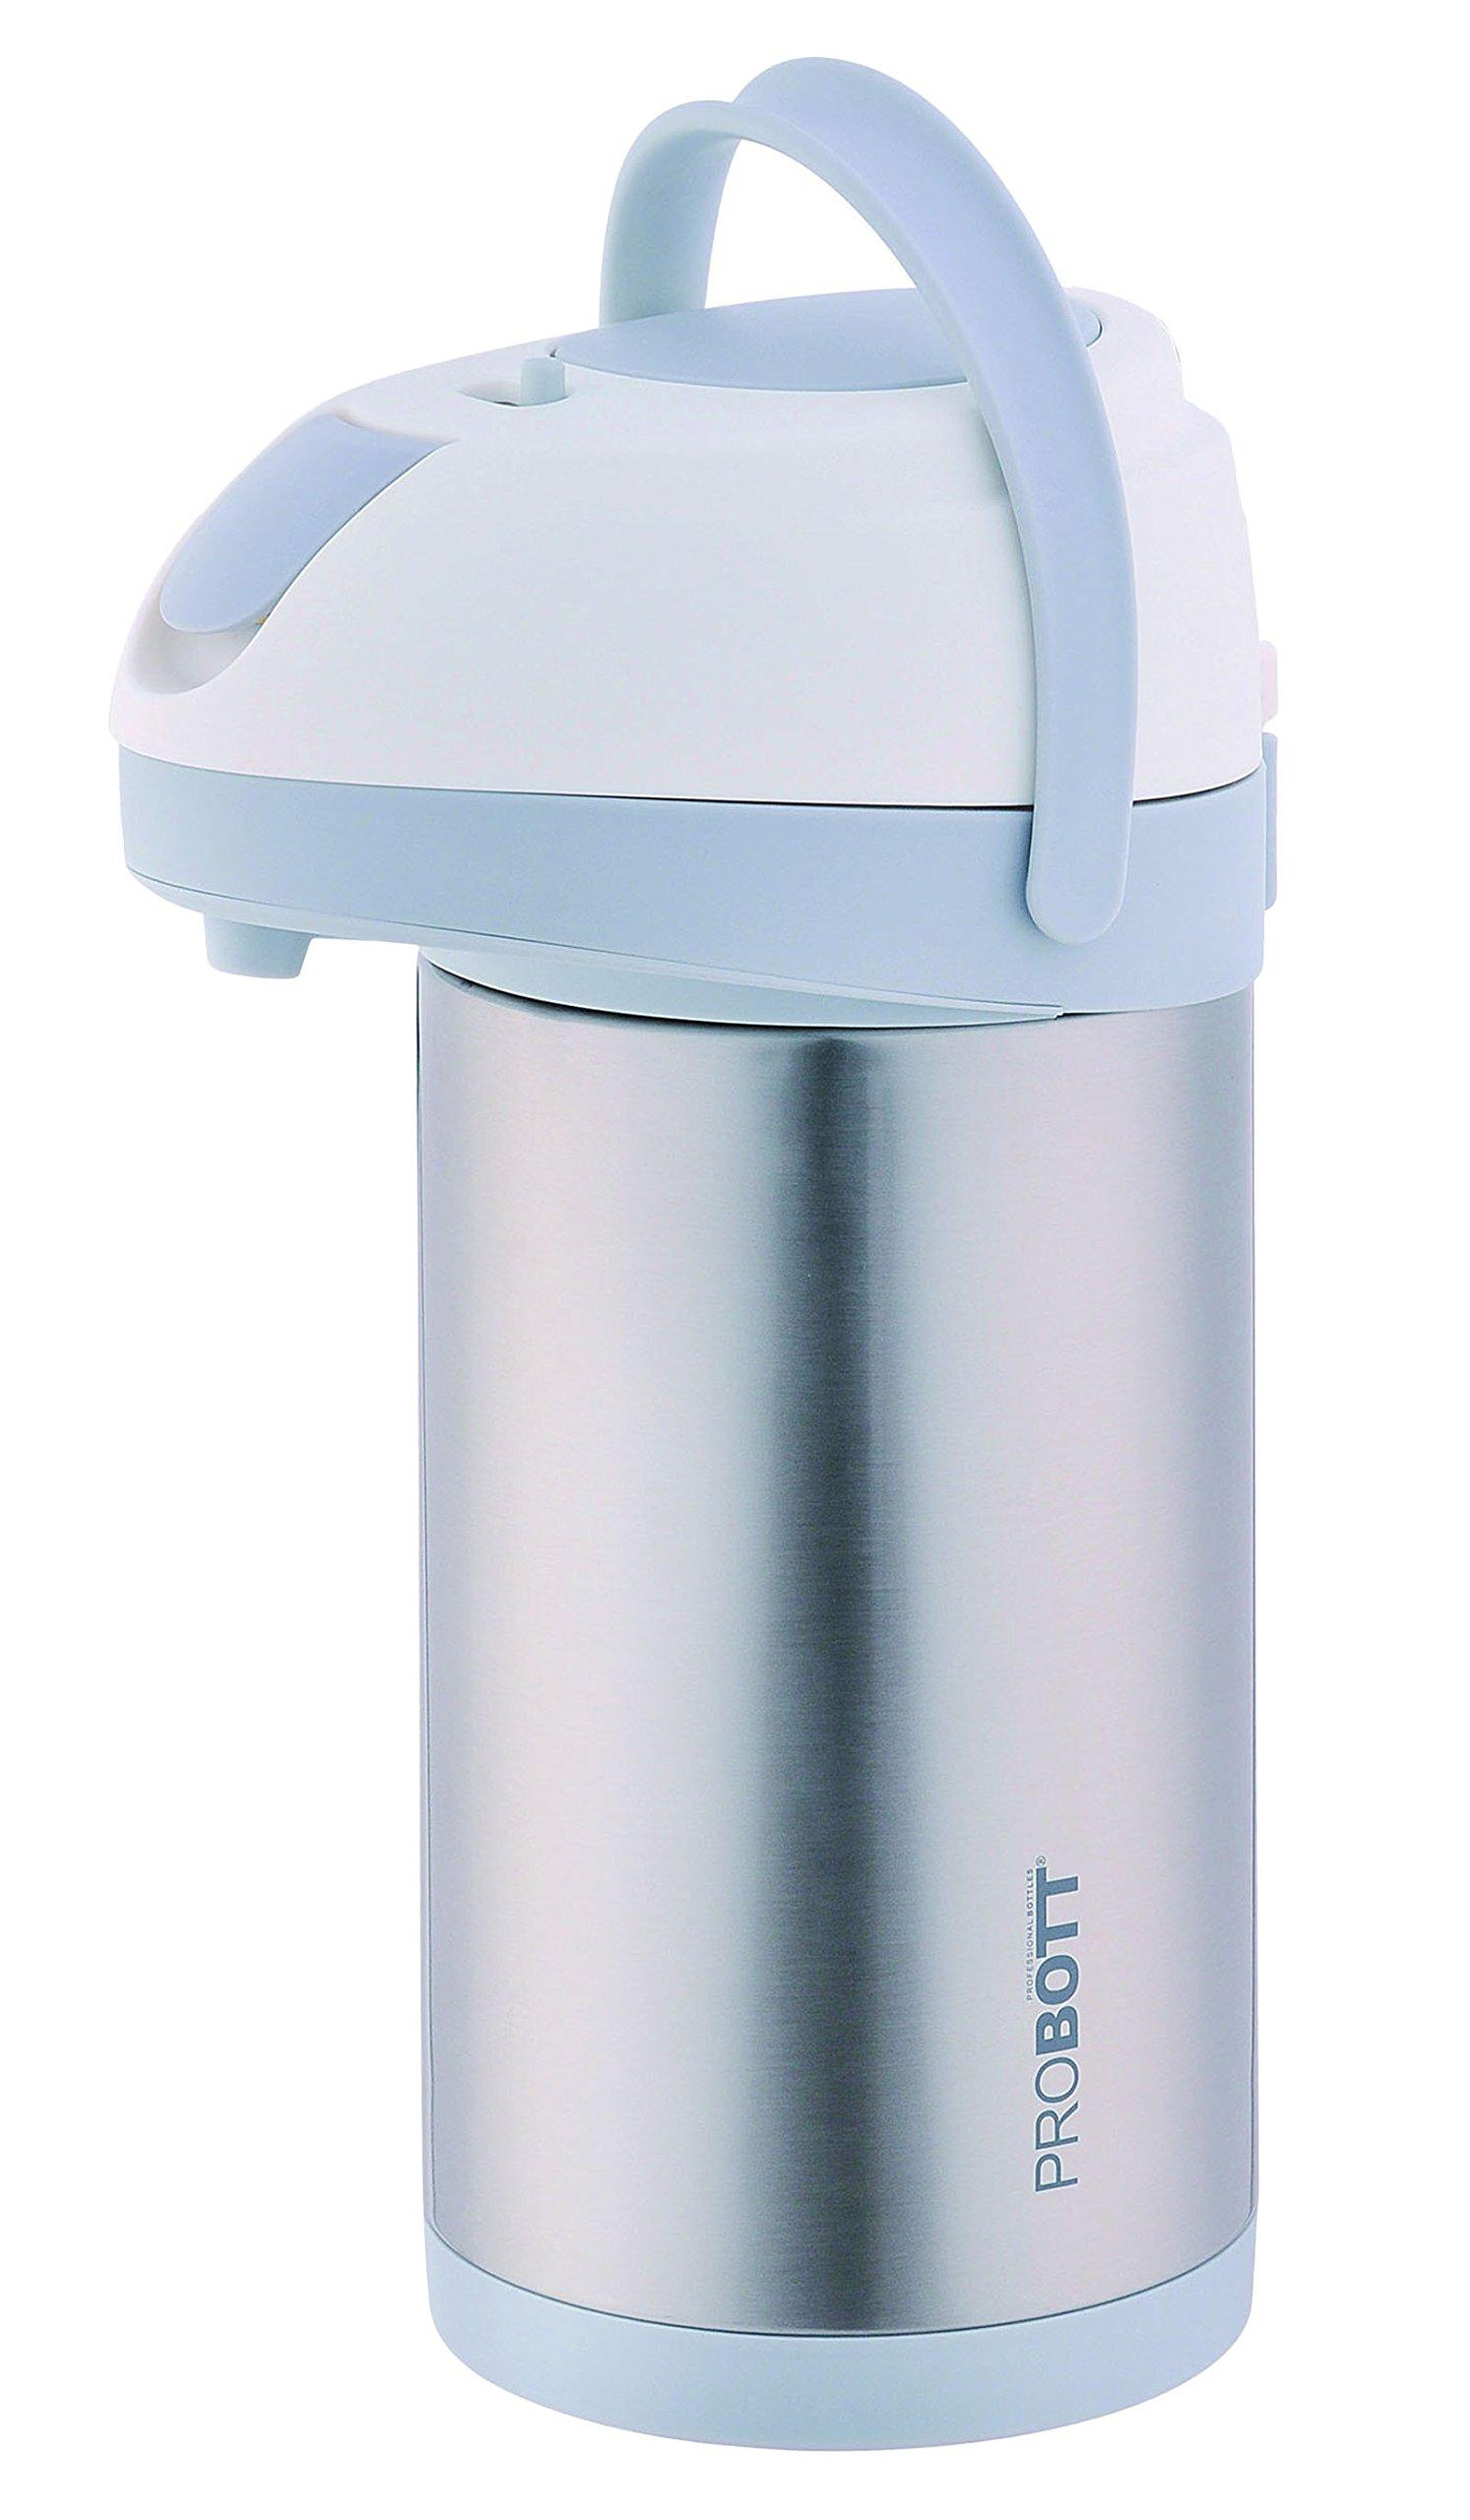 PROBOTT Stainless Steel Tea Coffee Airpot Vacuum Pump Flask With Lid 118 Oz